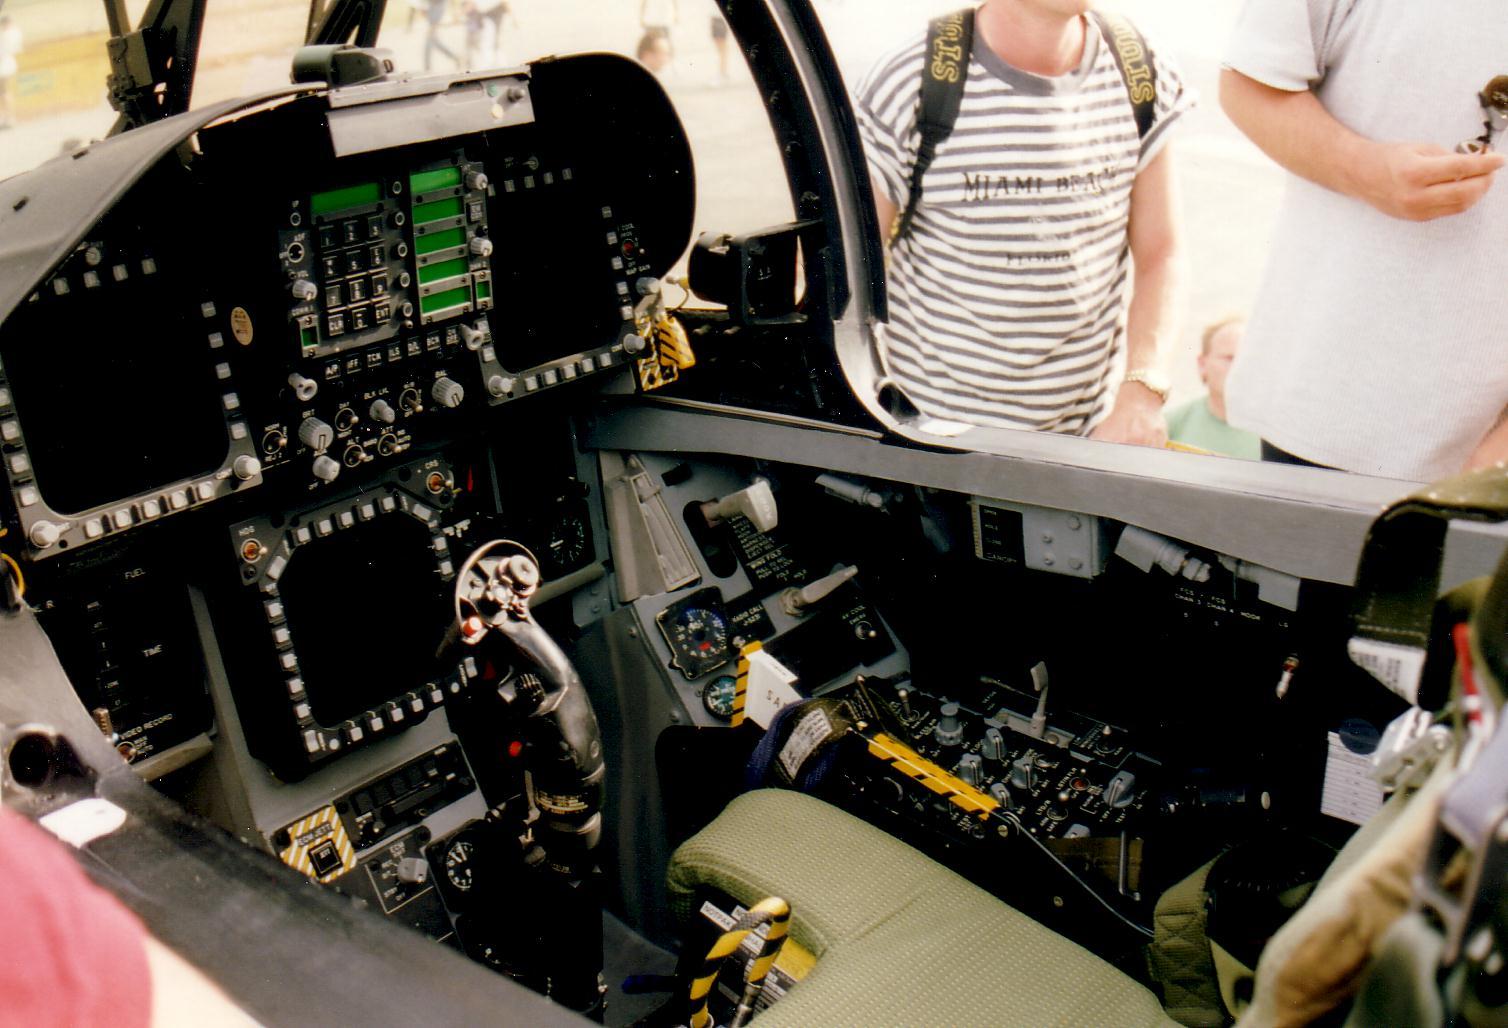 F 18 Cockpit Layout File:F18 Cockpi...